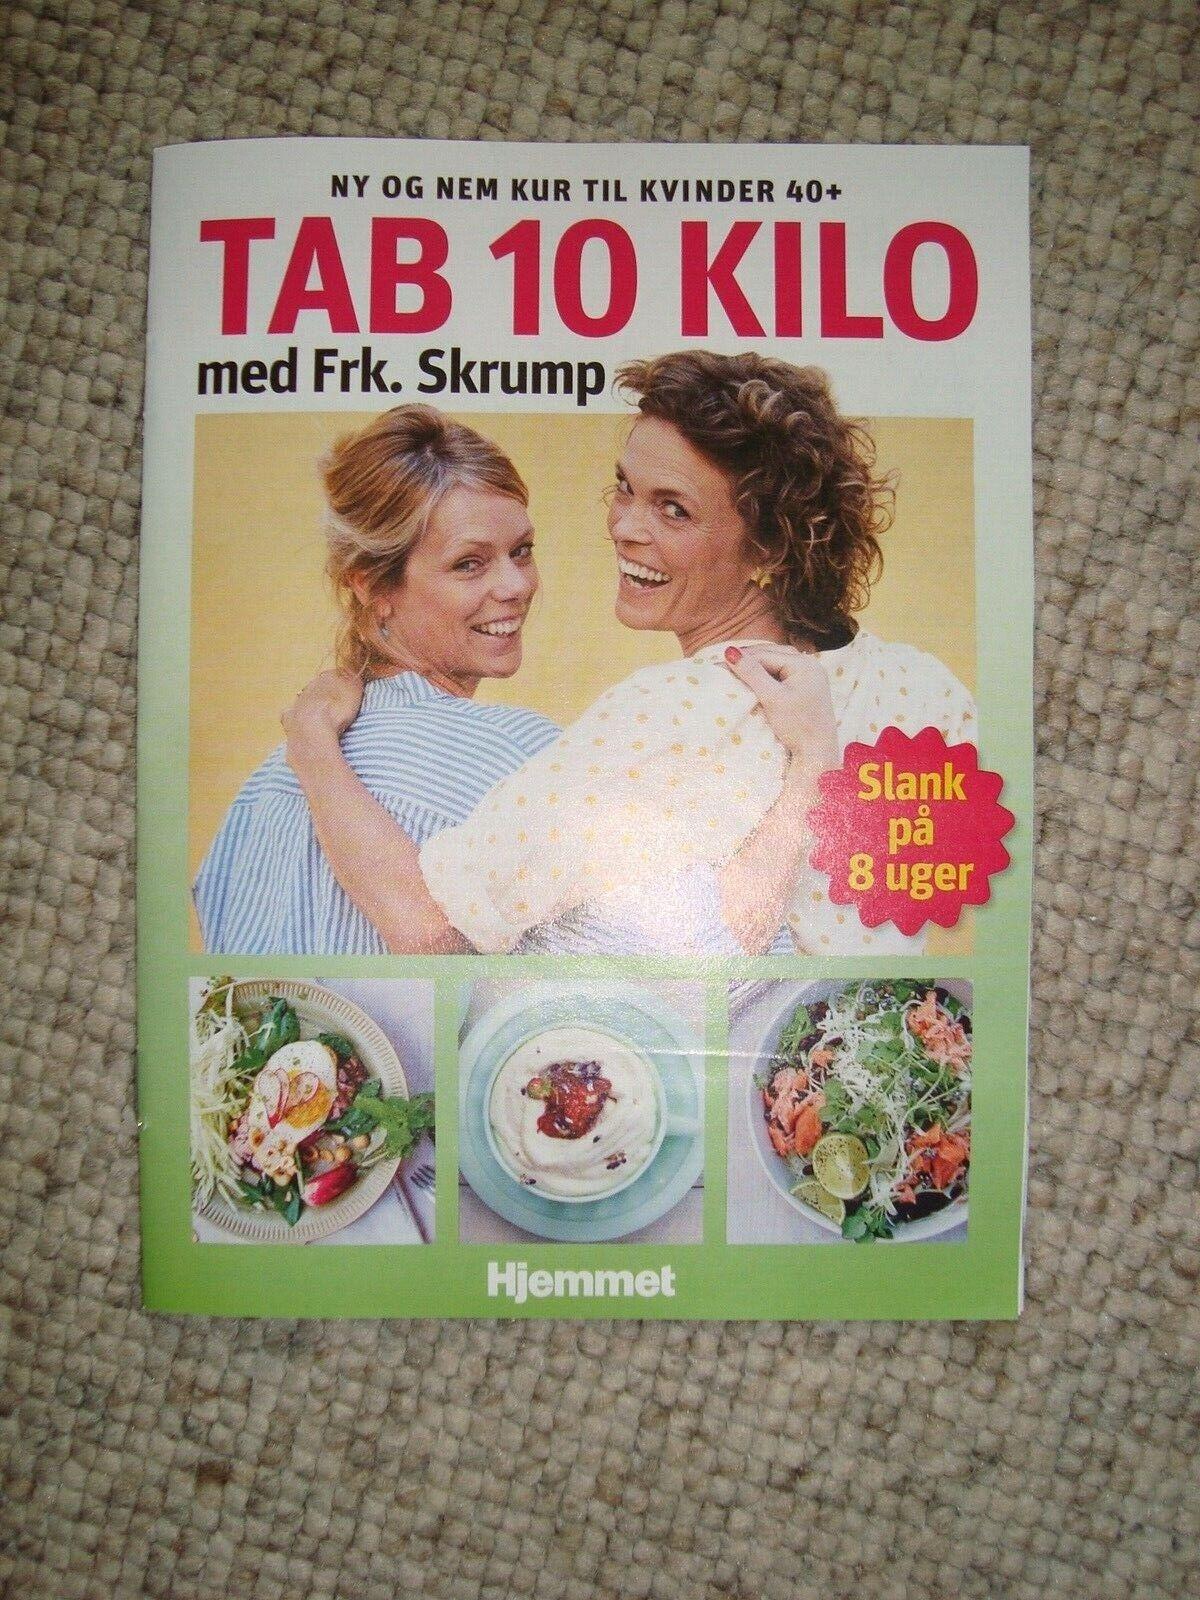 tab 10 kilo